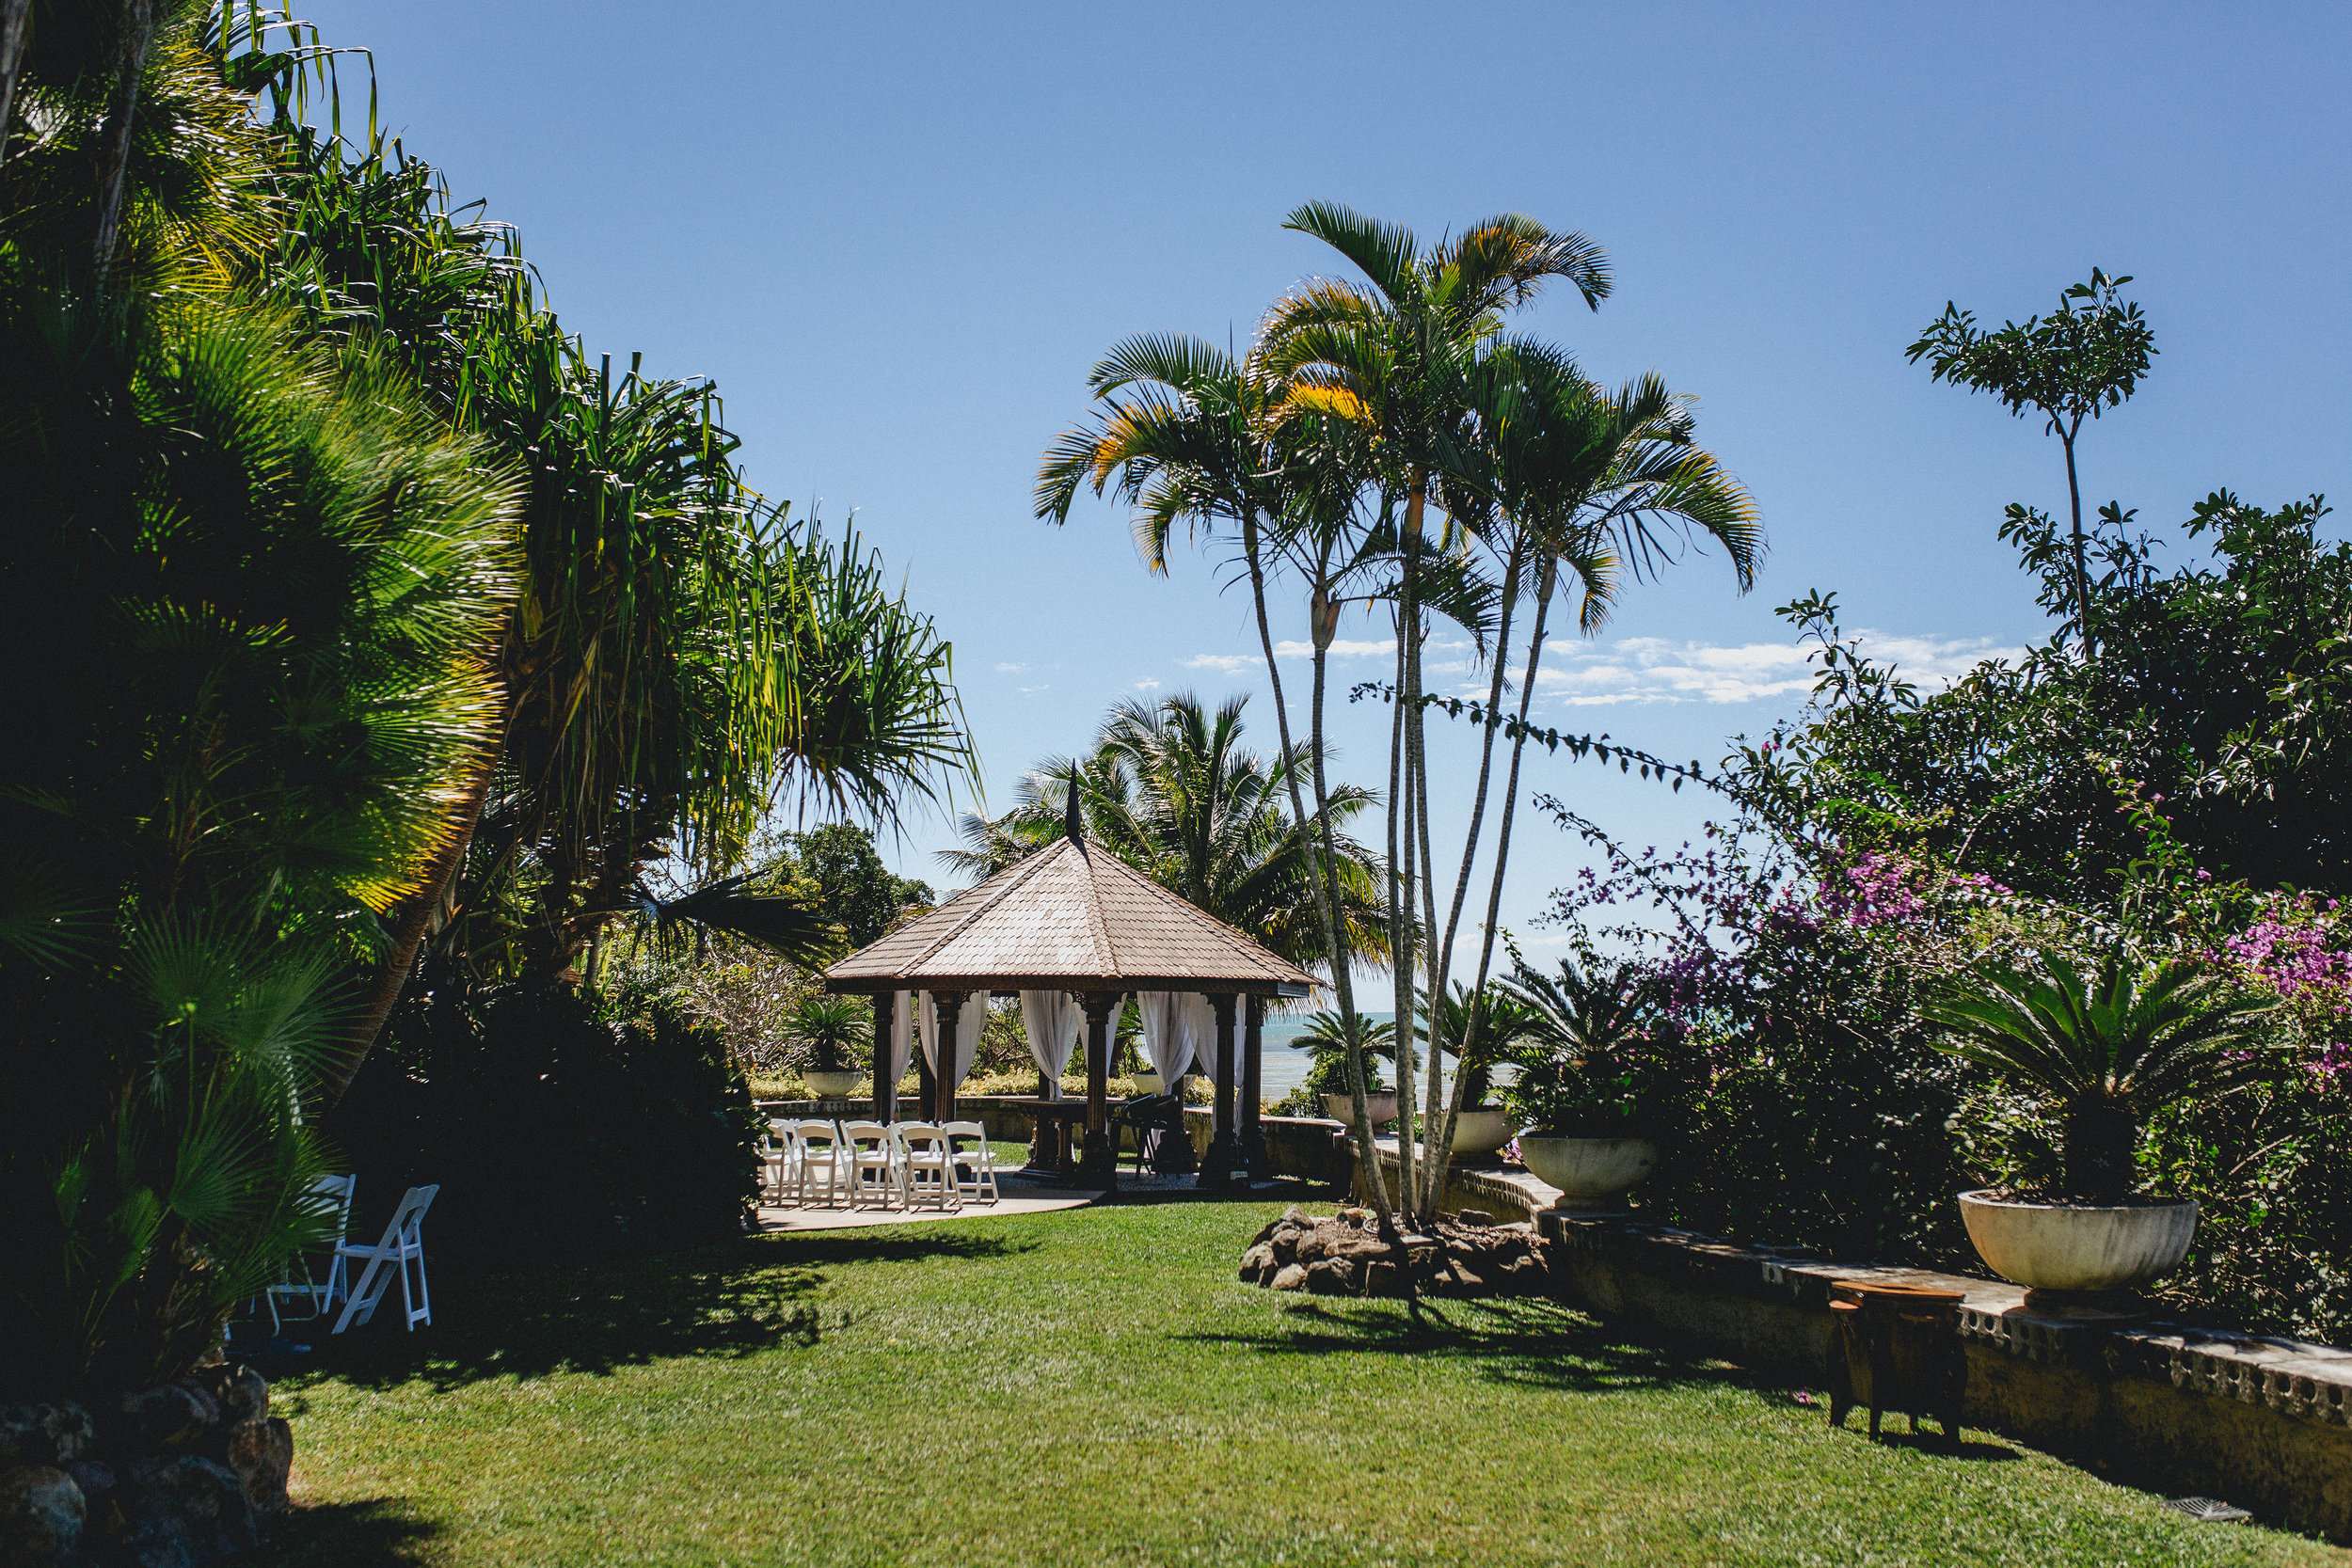 Villa-Botanica-Playback-Studios(95of873).jpg